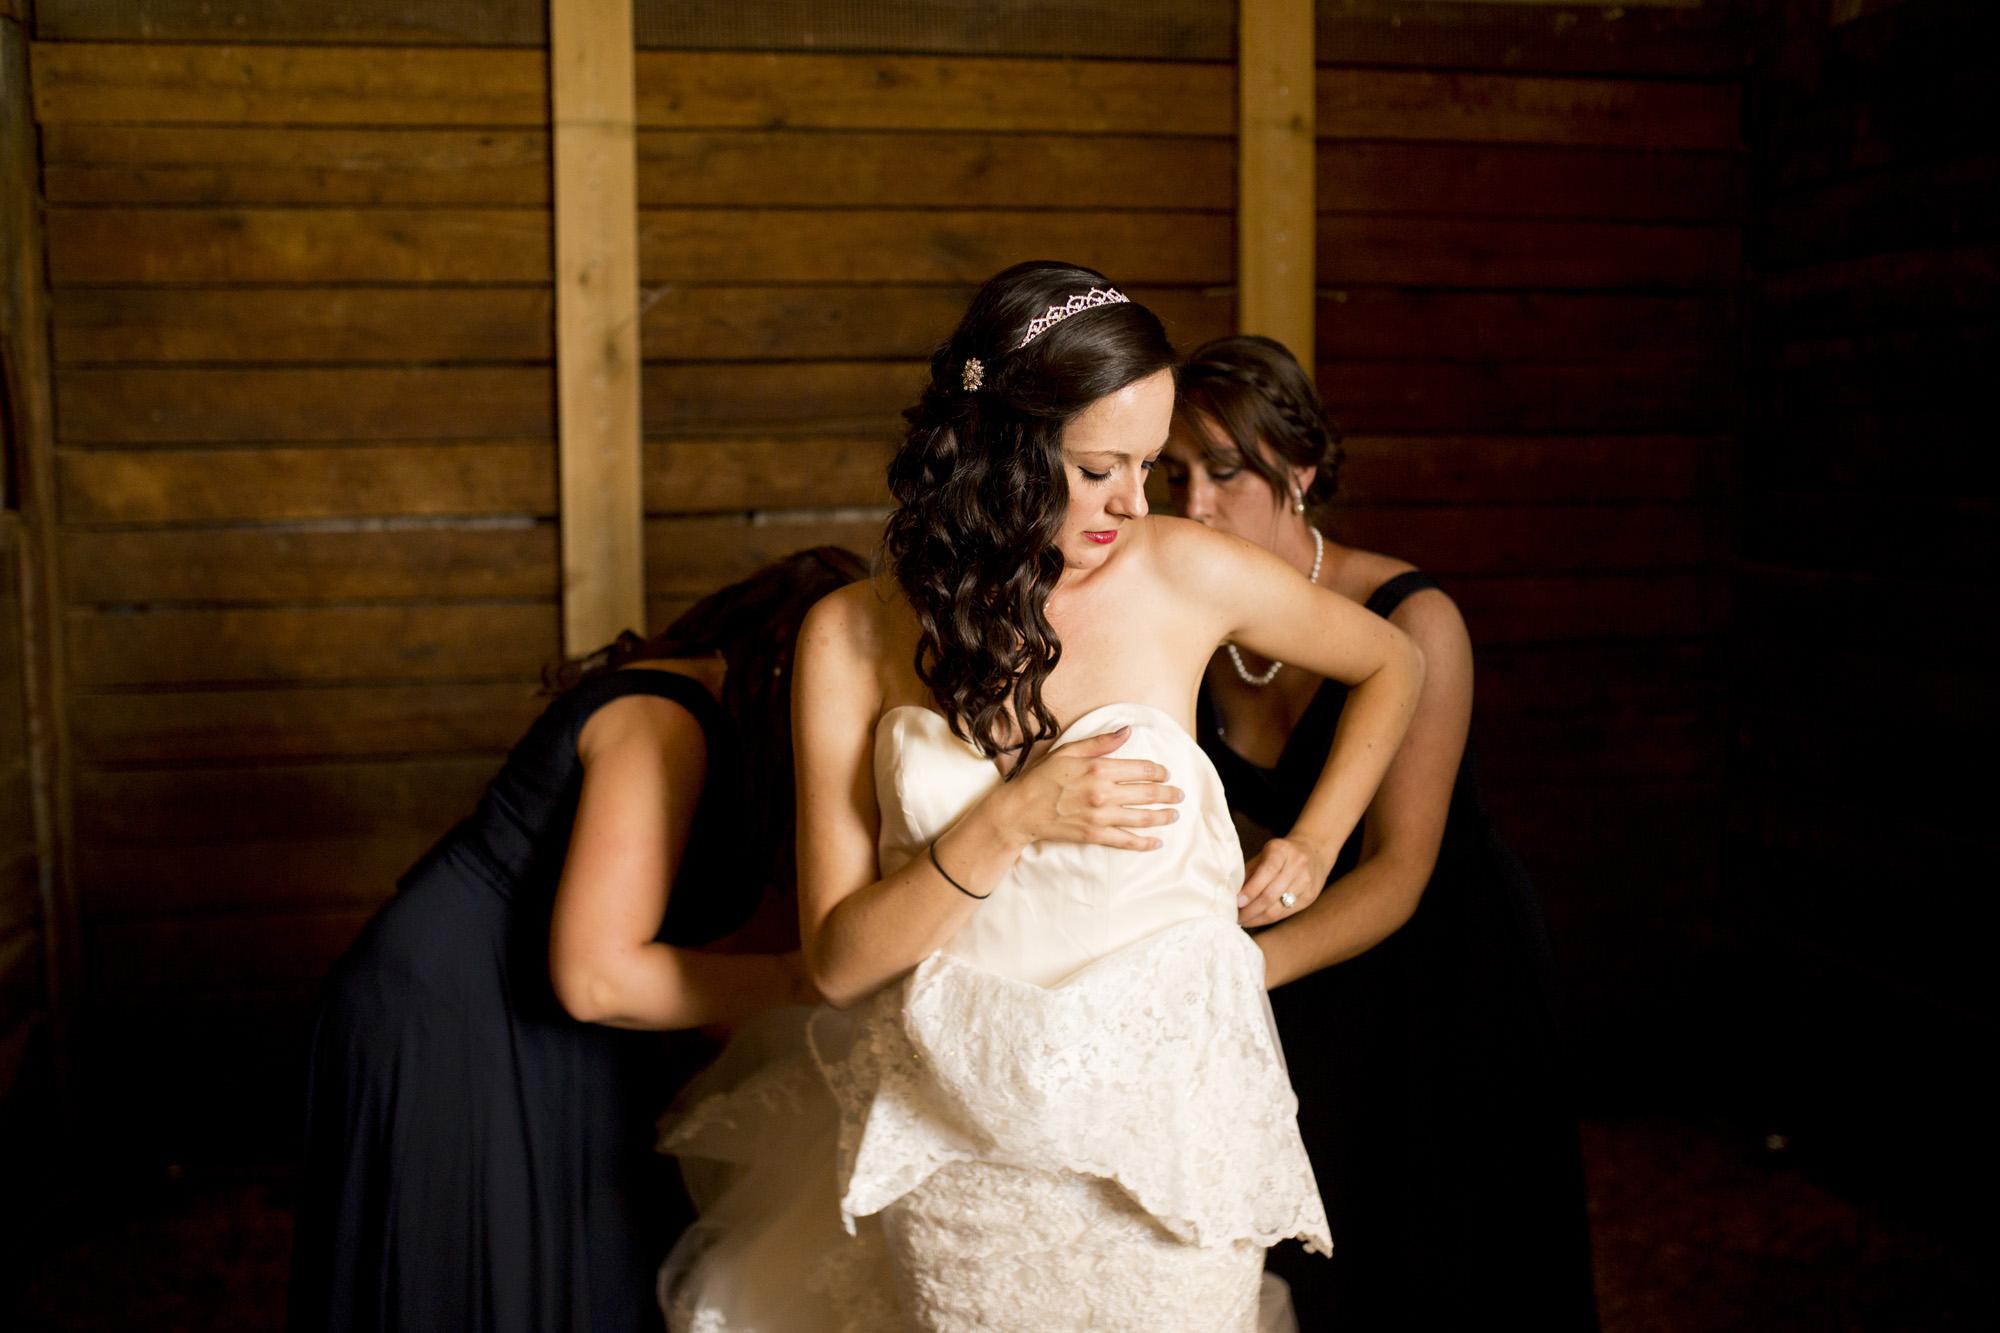 Seriously_Sabrina_Photography_Bowling_Green_Kentucky_Highland_Stables_Wedding_Wolff11.jpg